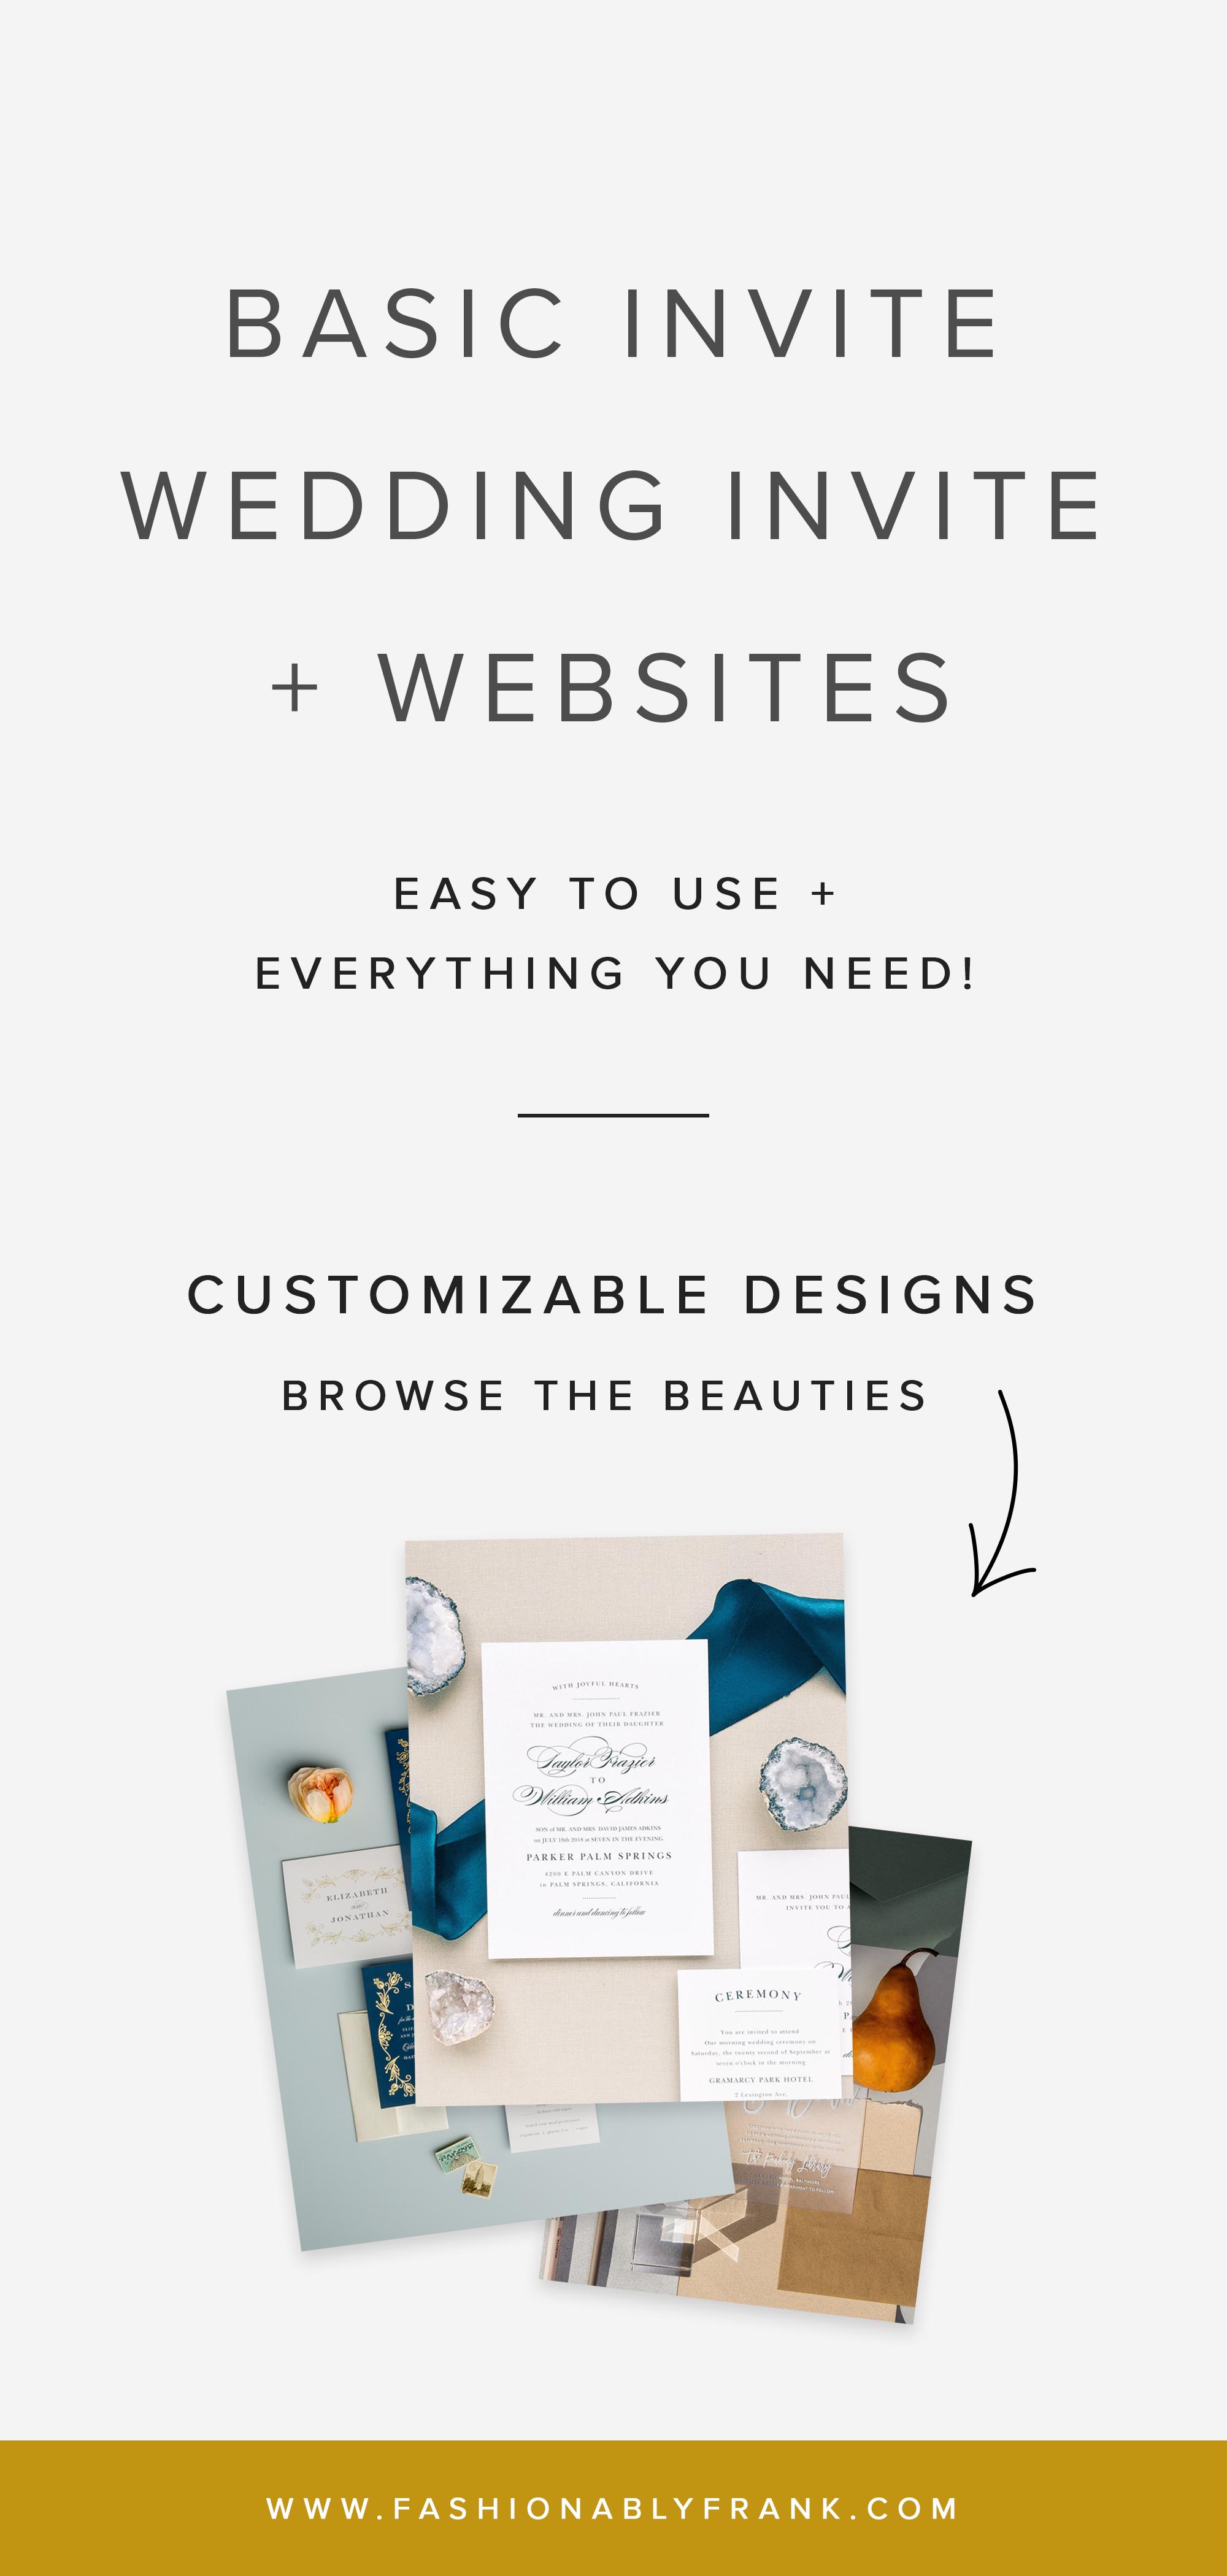 Basic Invite Wedding Bridal Invitations Websites.png